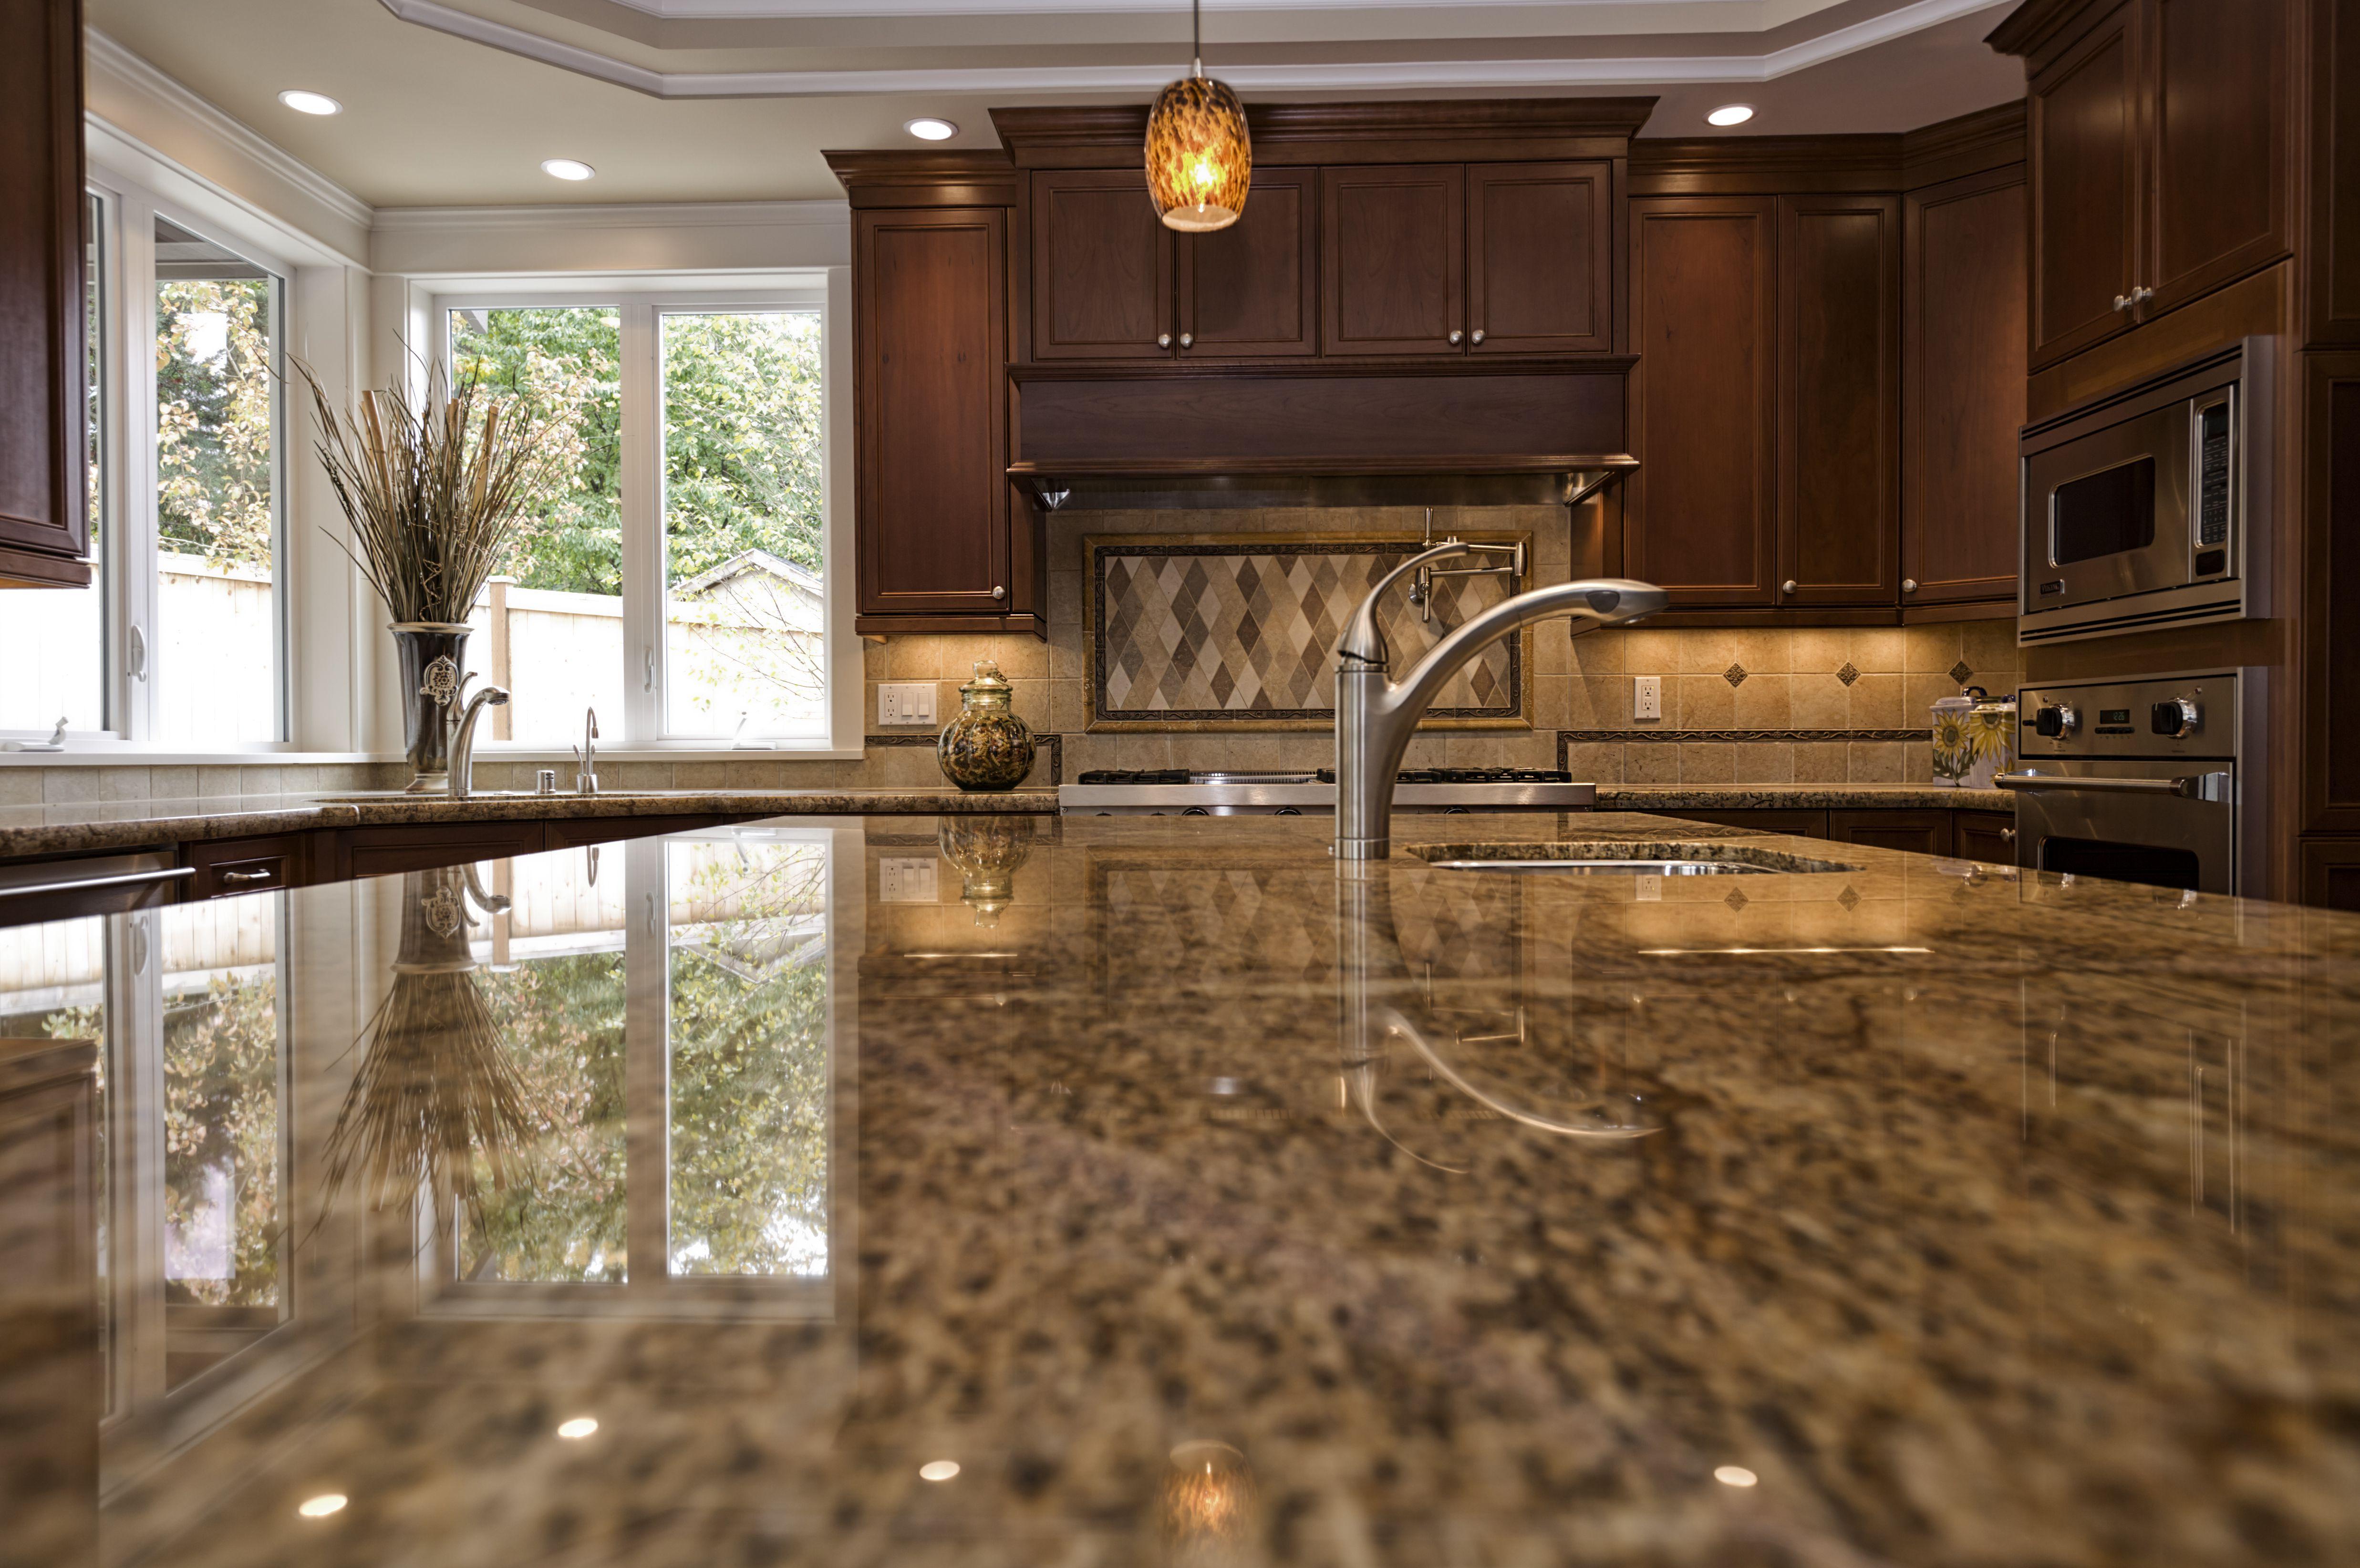 quartz vs laminate countertops. Black Bedroom Furniture Sets. Home Design Ideas